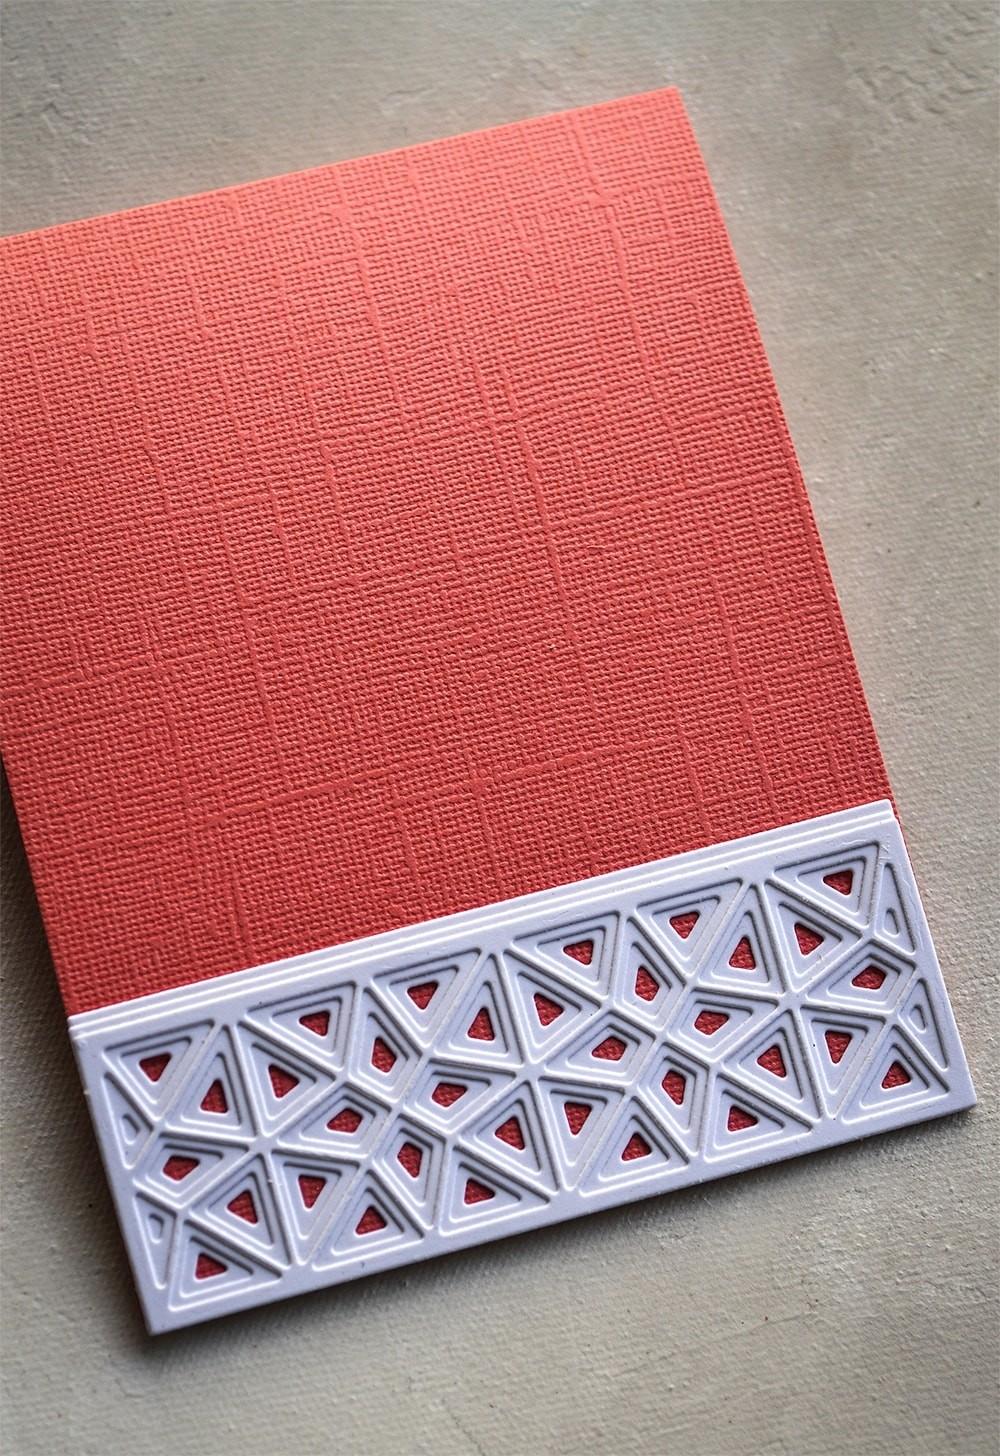 Birch Press Mini Splendor Bevel Plate Layer Set 56110